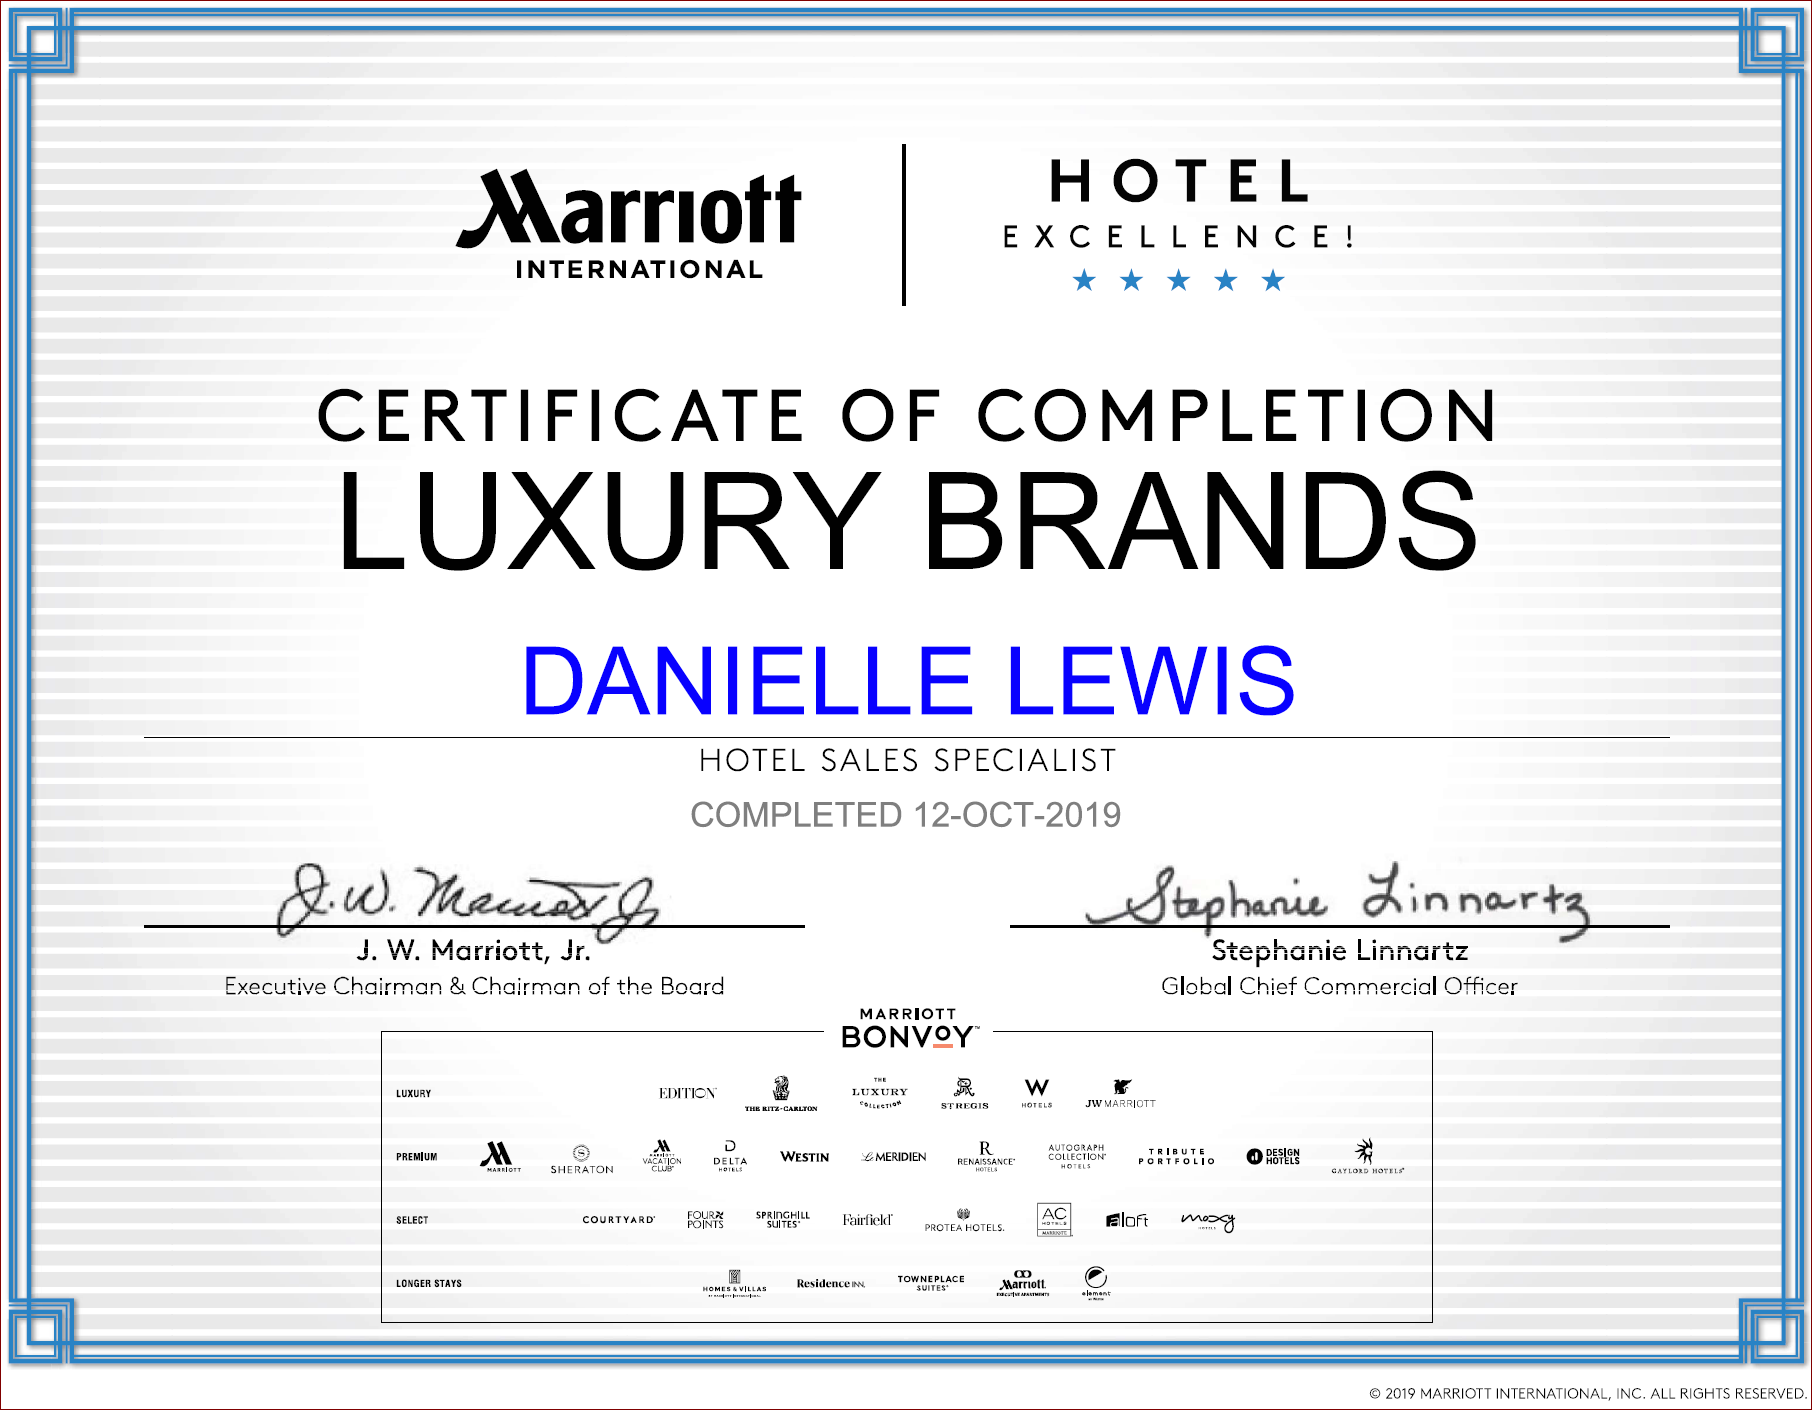 SelfishMe Travel - Marriott International Luxury Brands Certificate